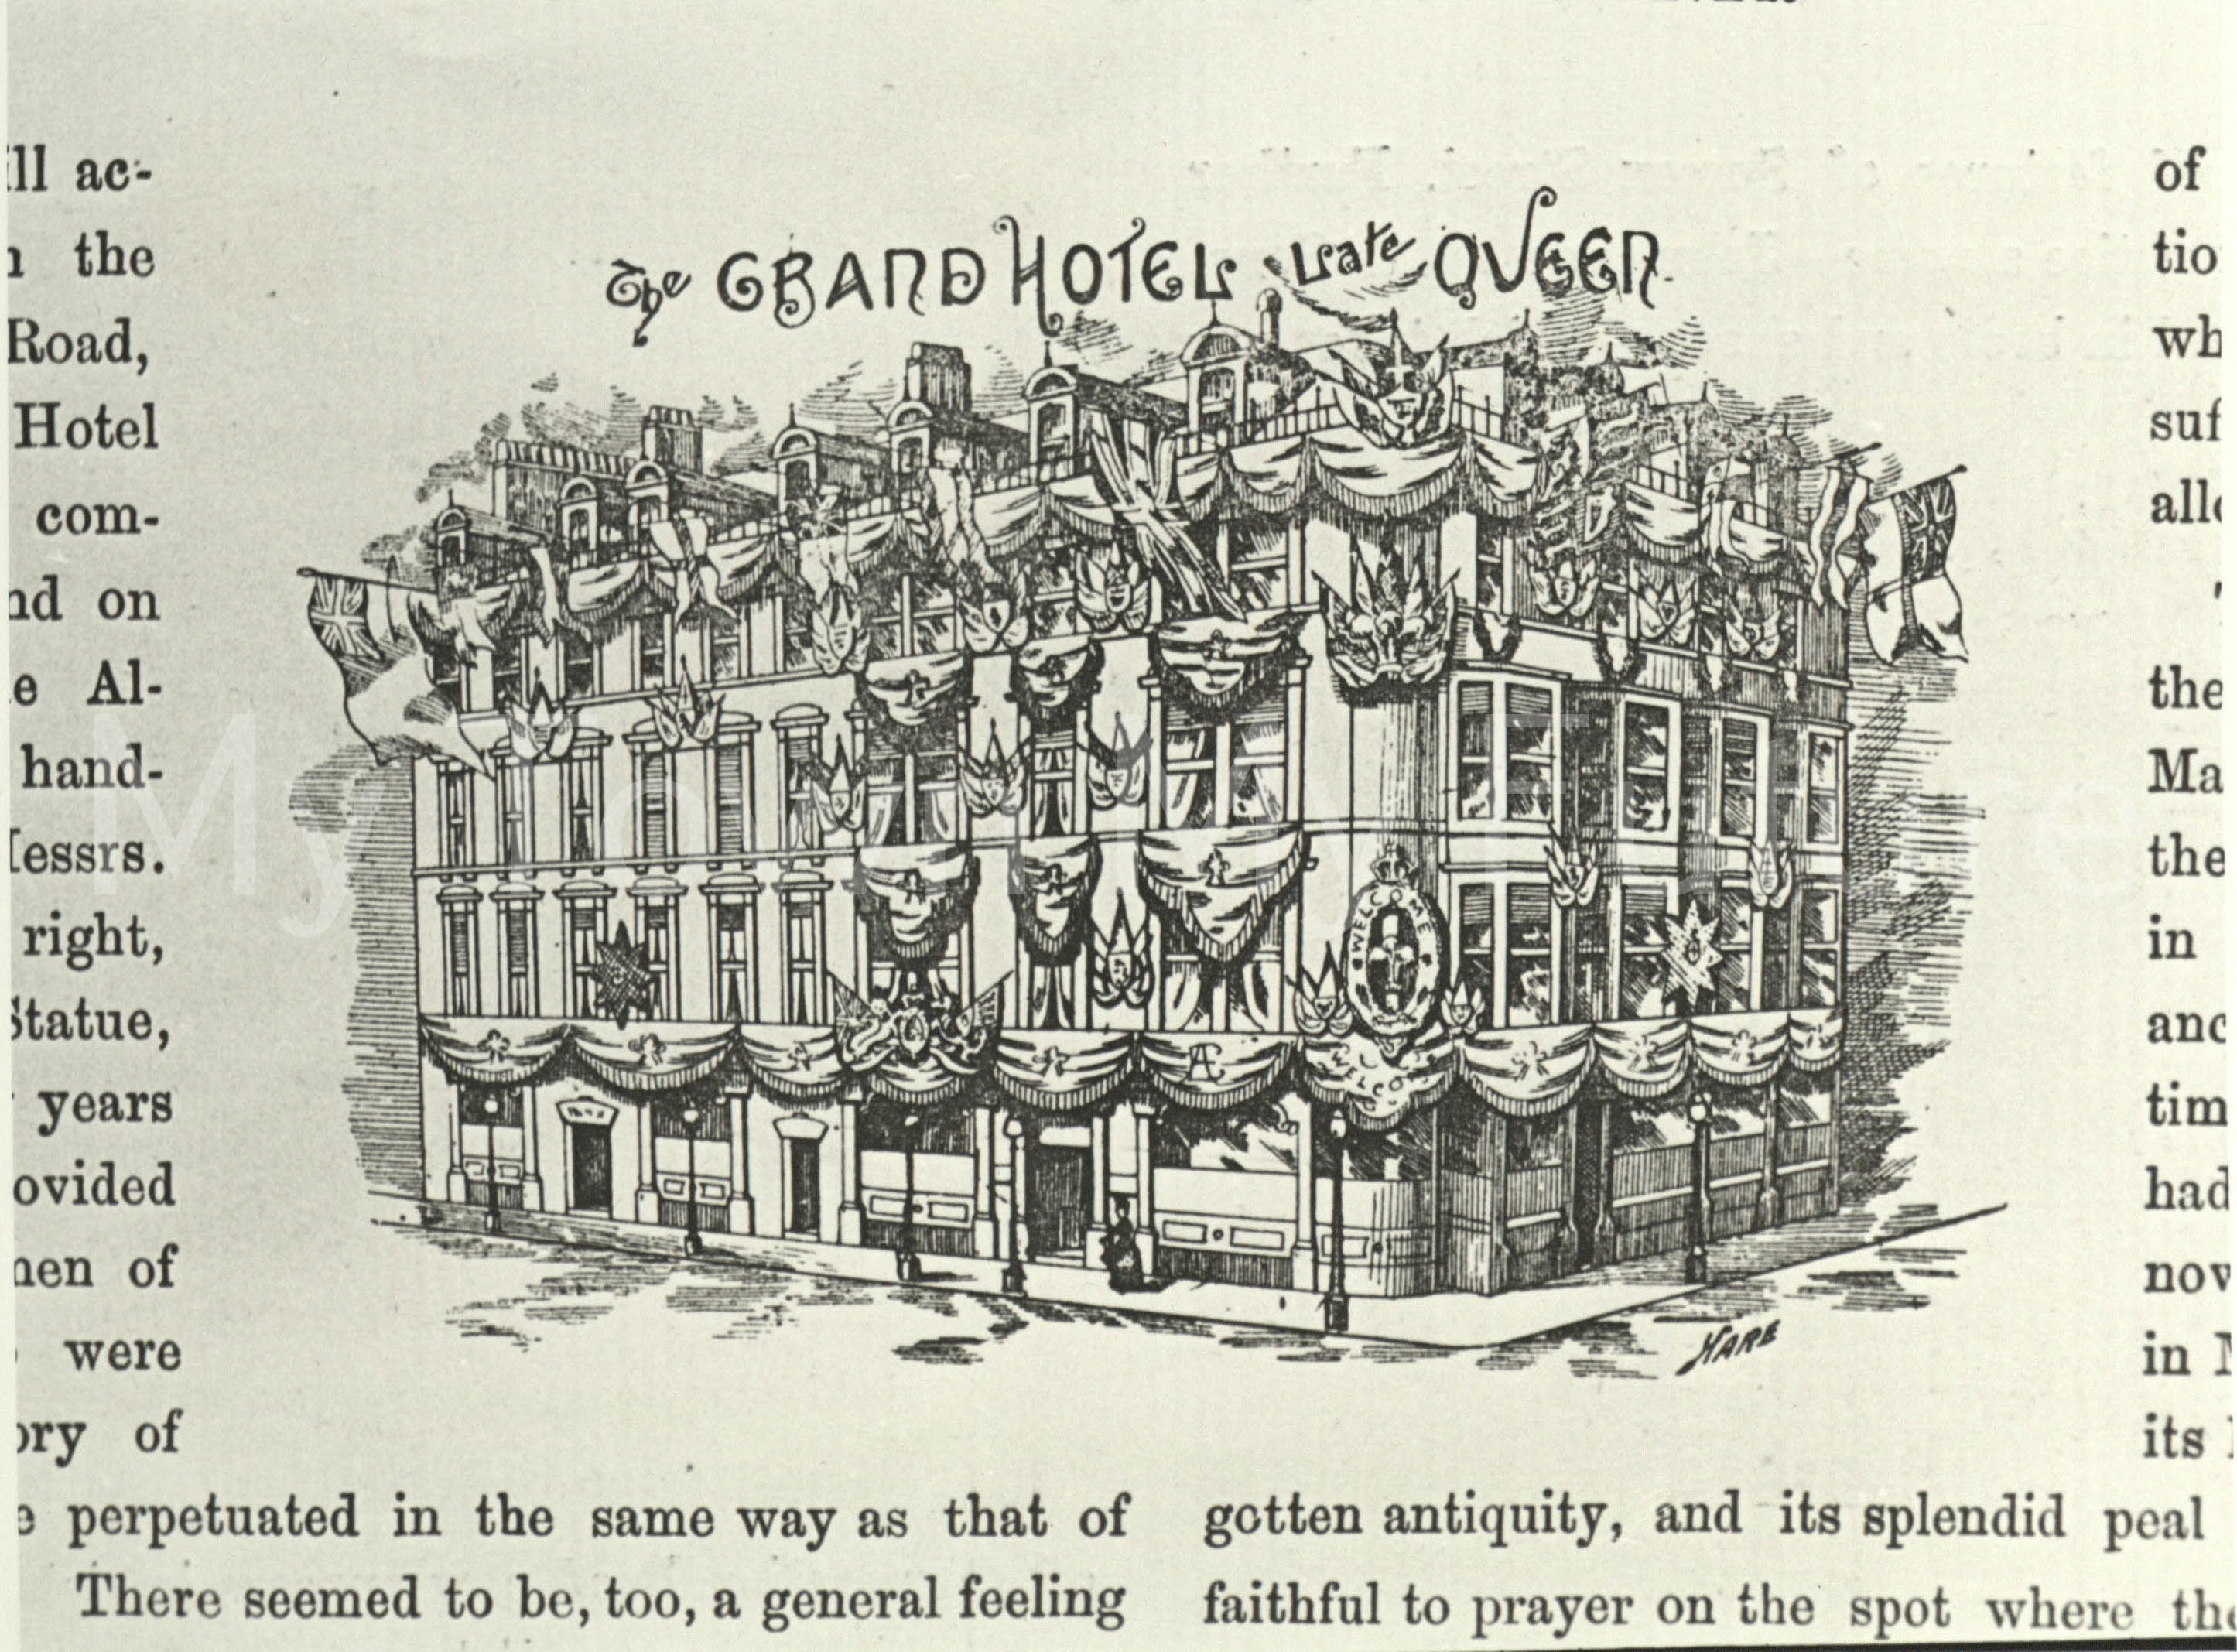 The Grand Hotel,Zetland Road